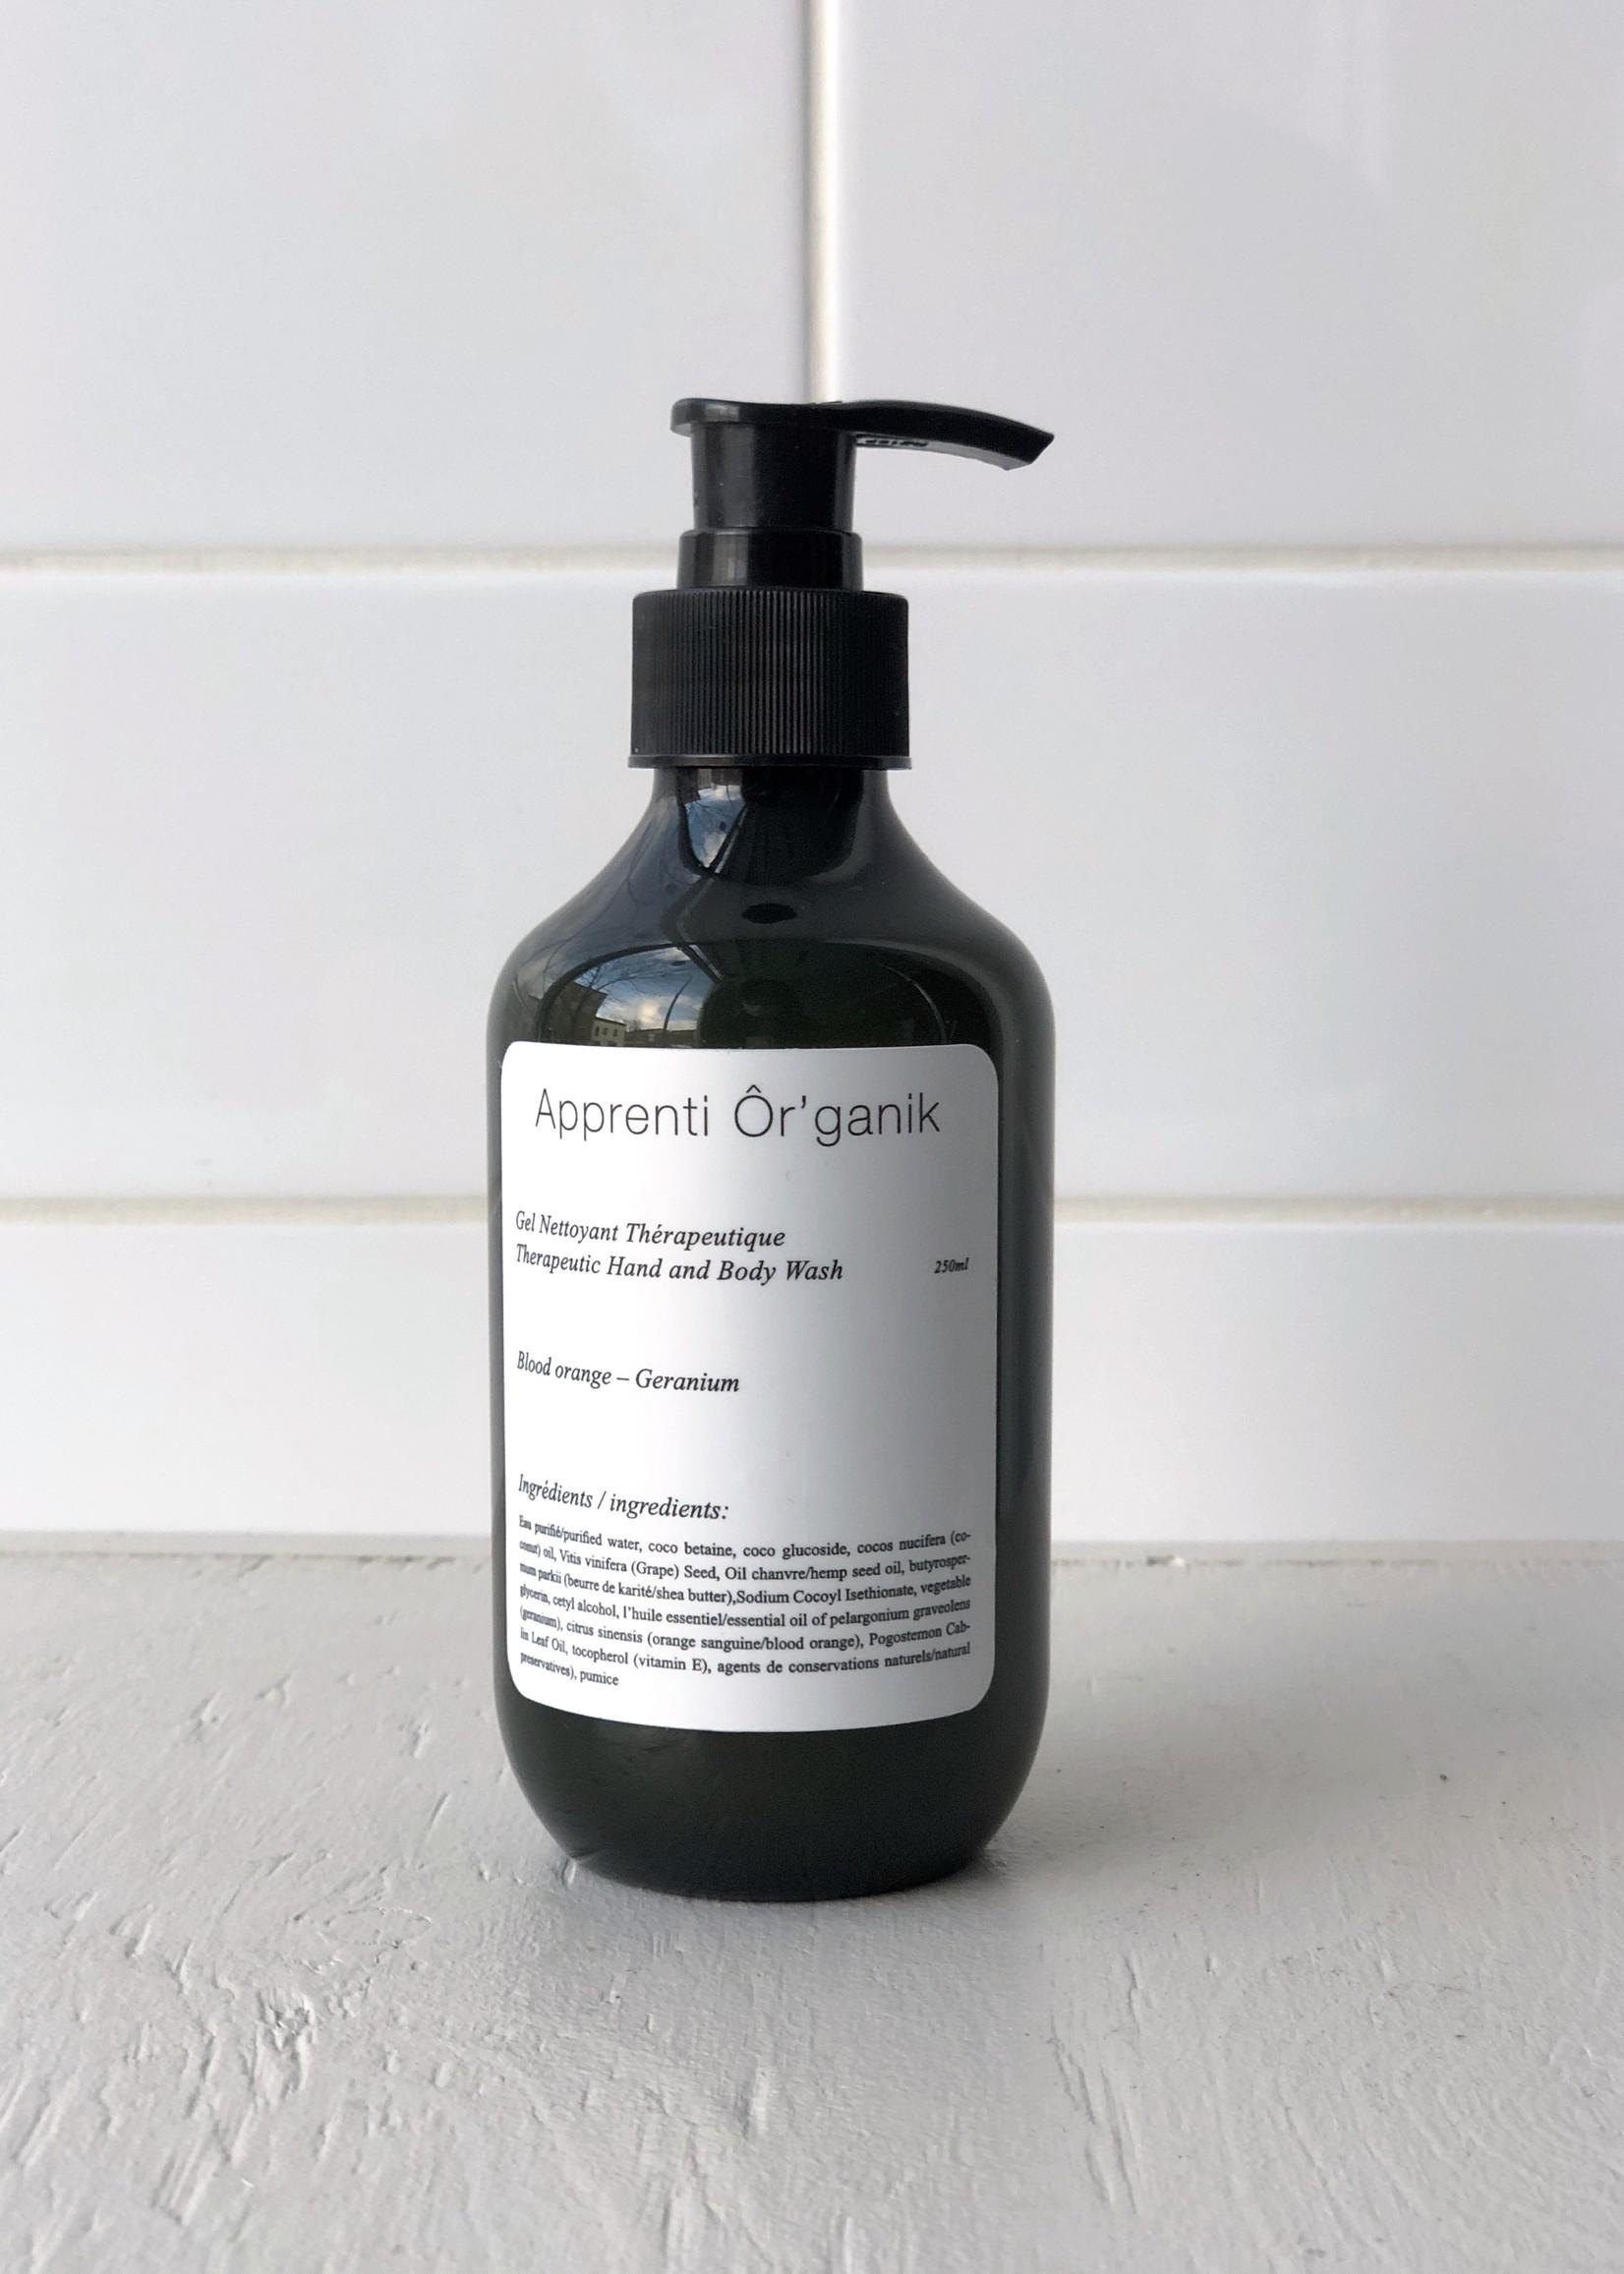 Apprenti Organik Therapeutic Hand and Body Washes